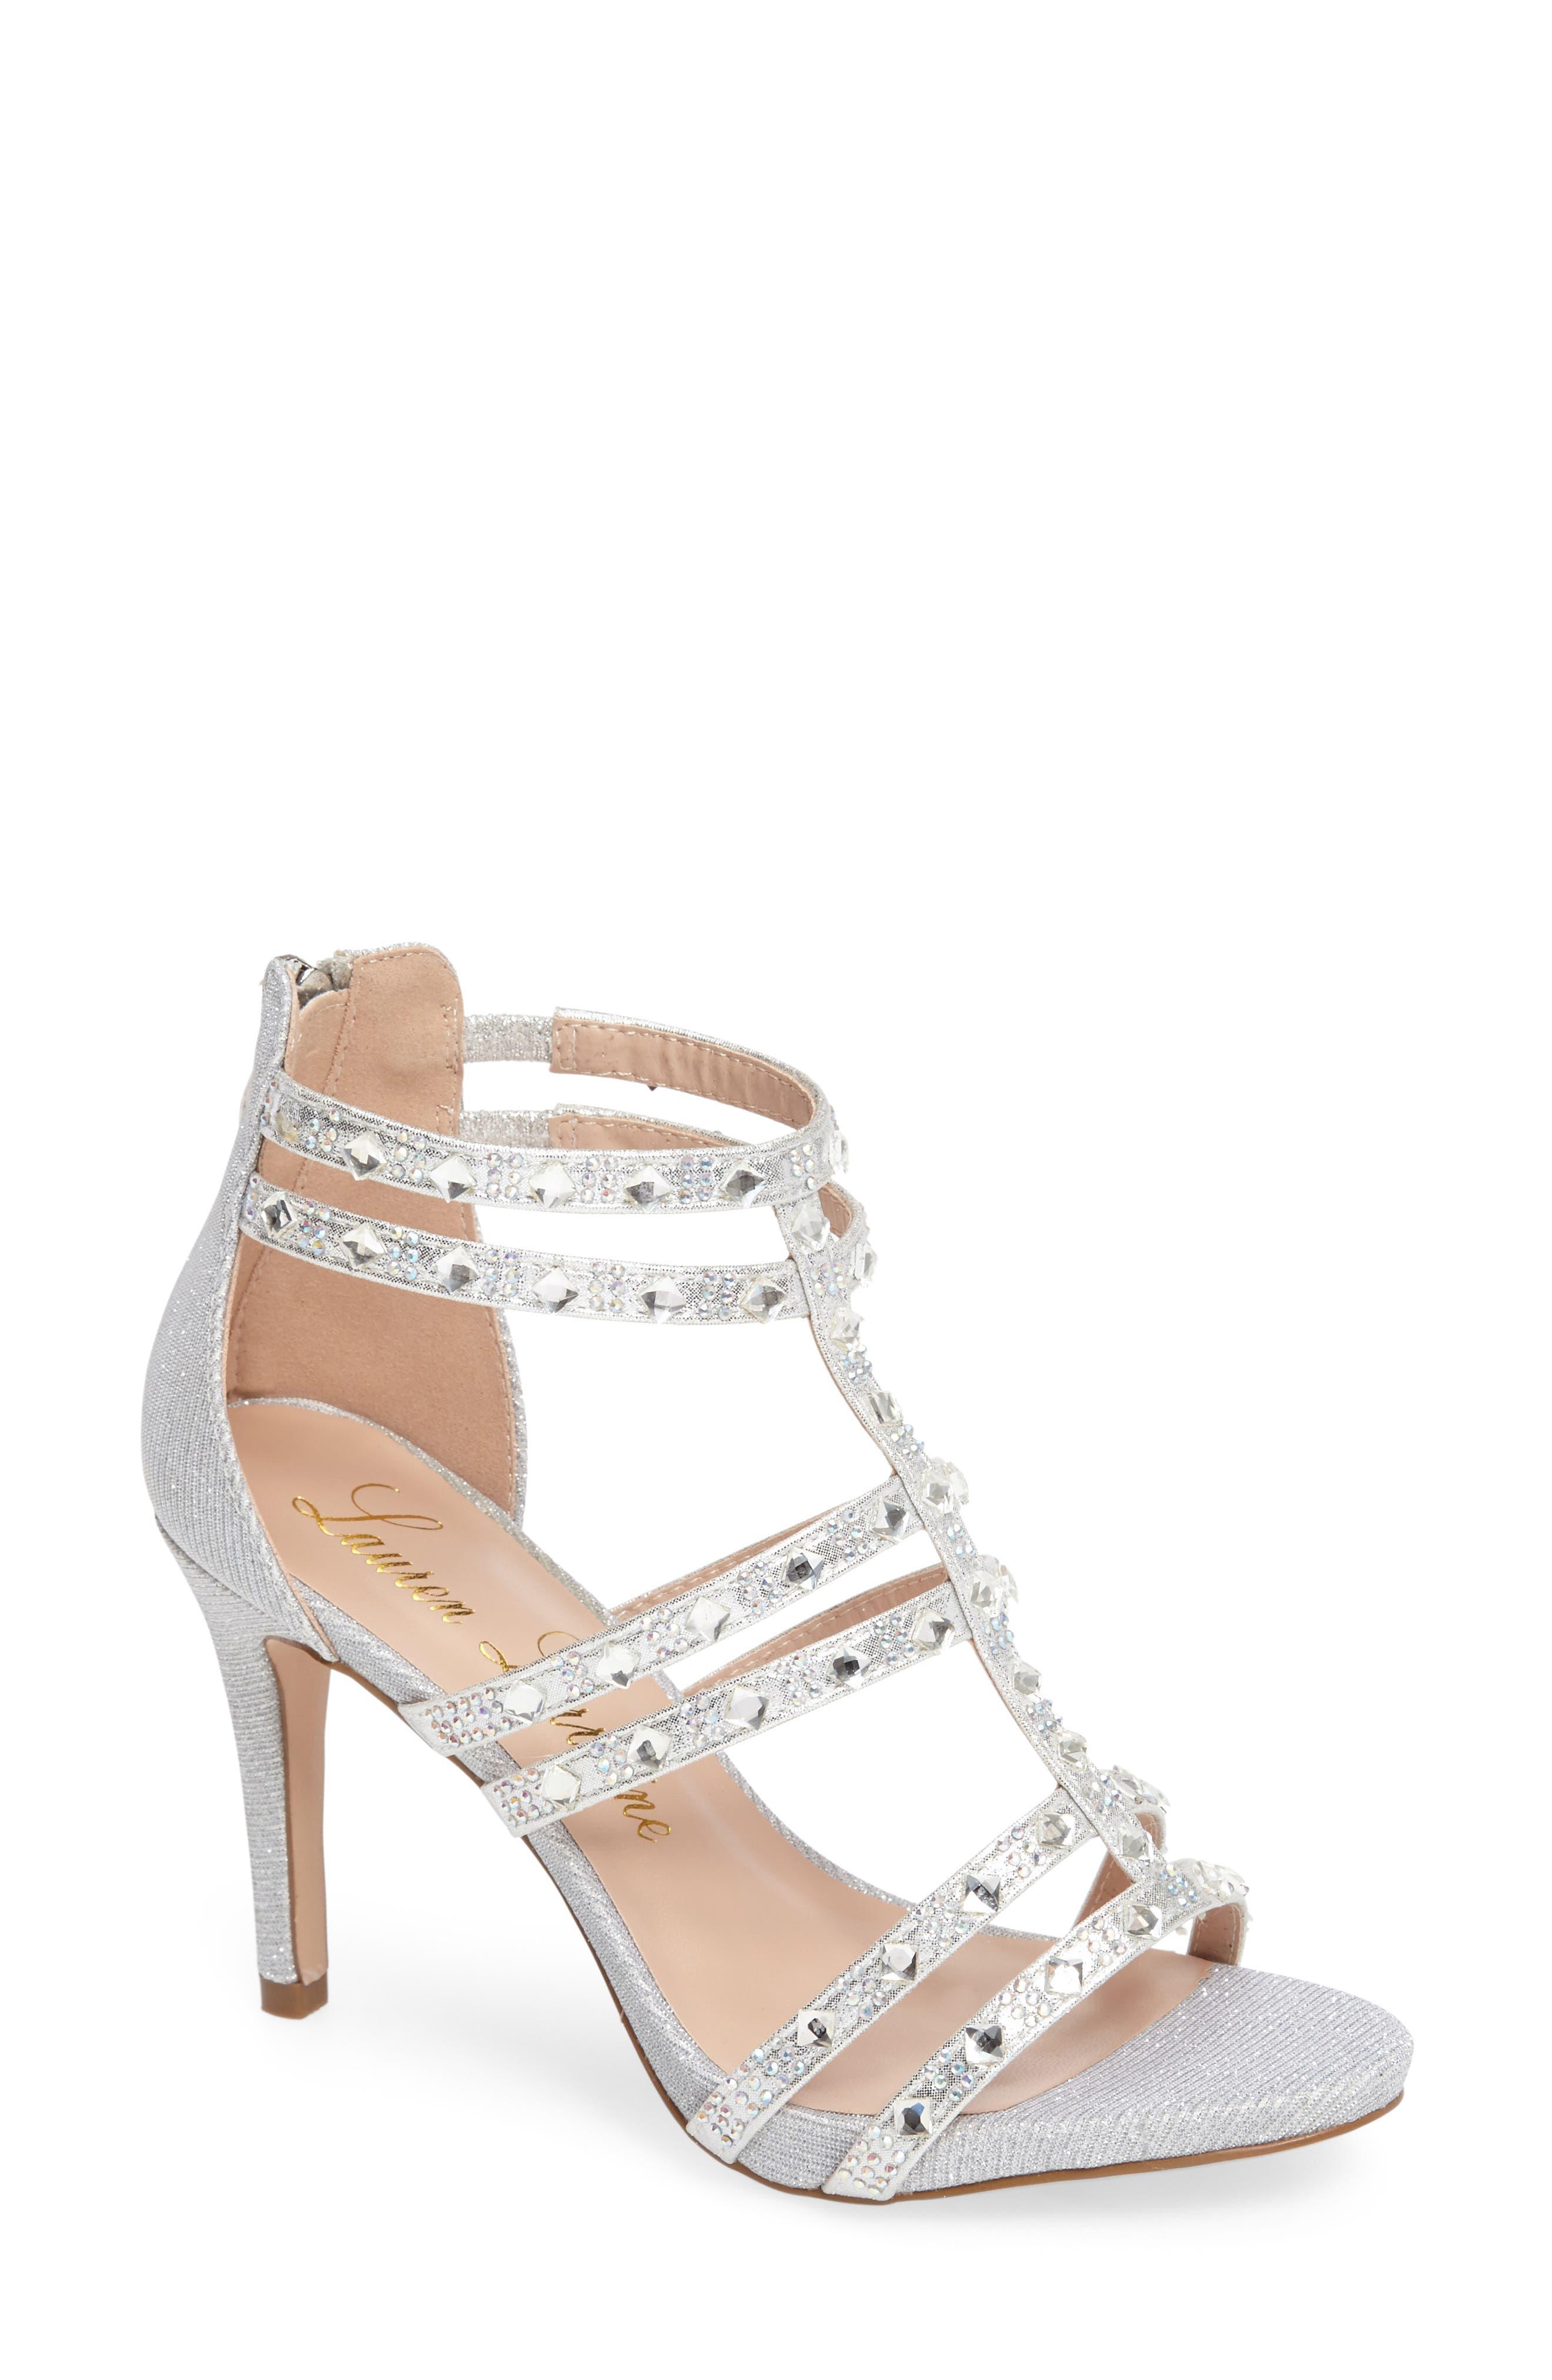 LAUREN LORRAINE Embellished Sandal